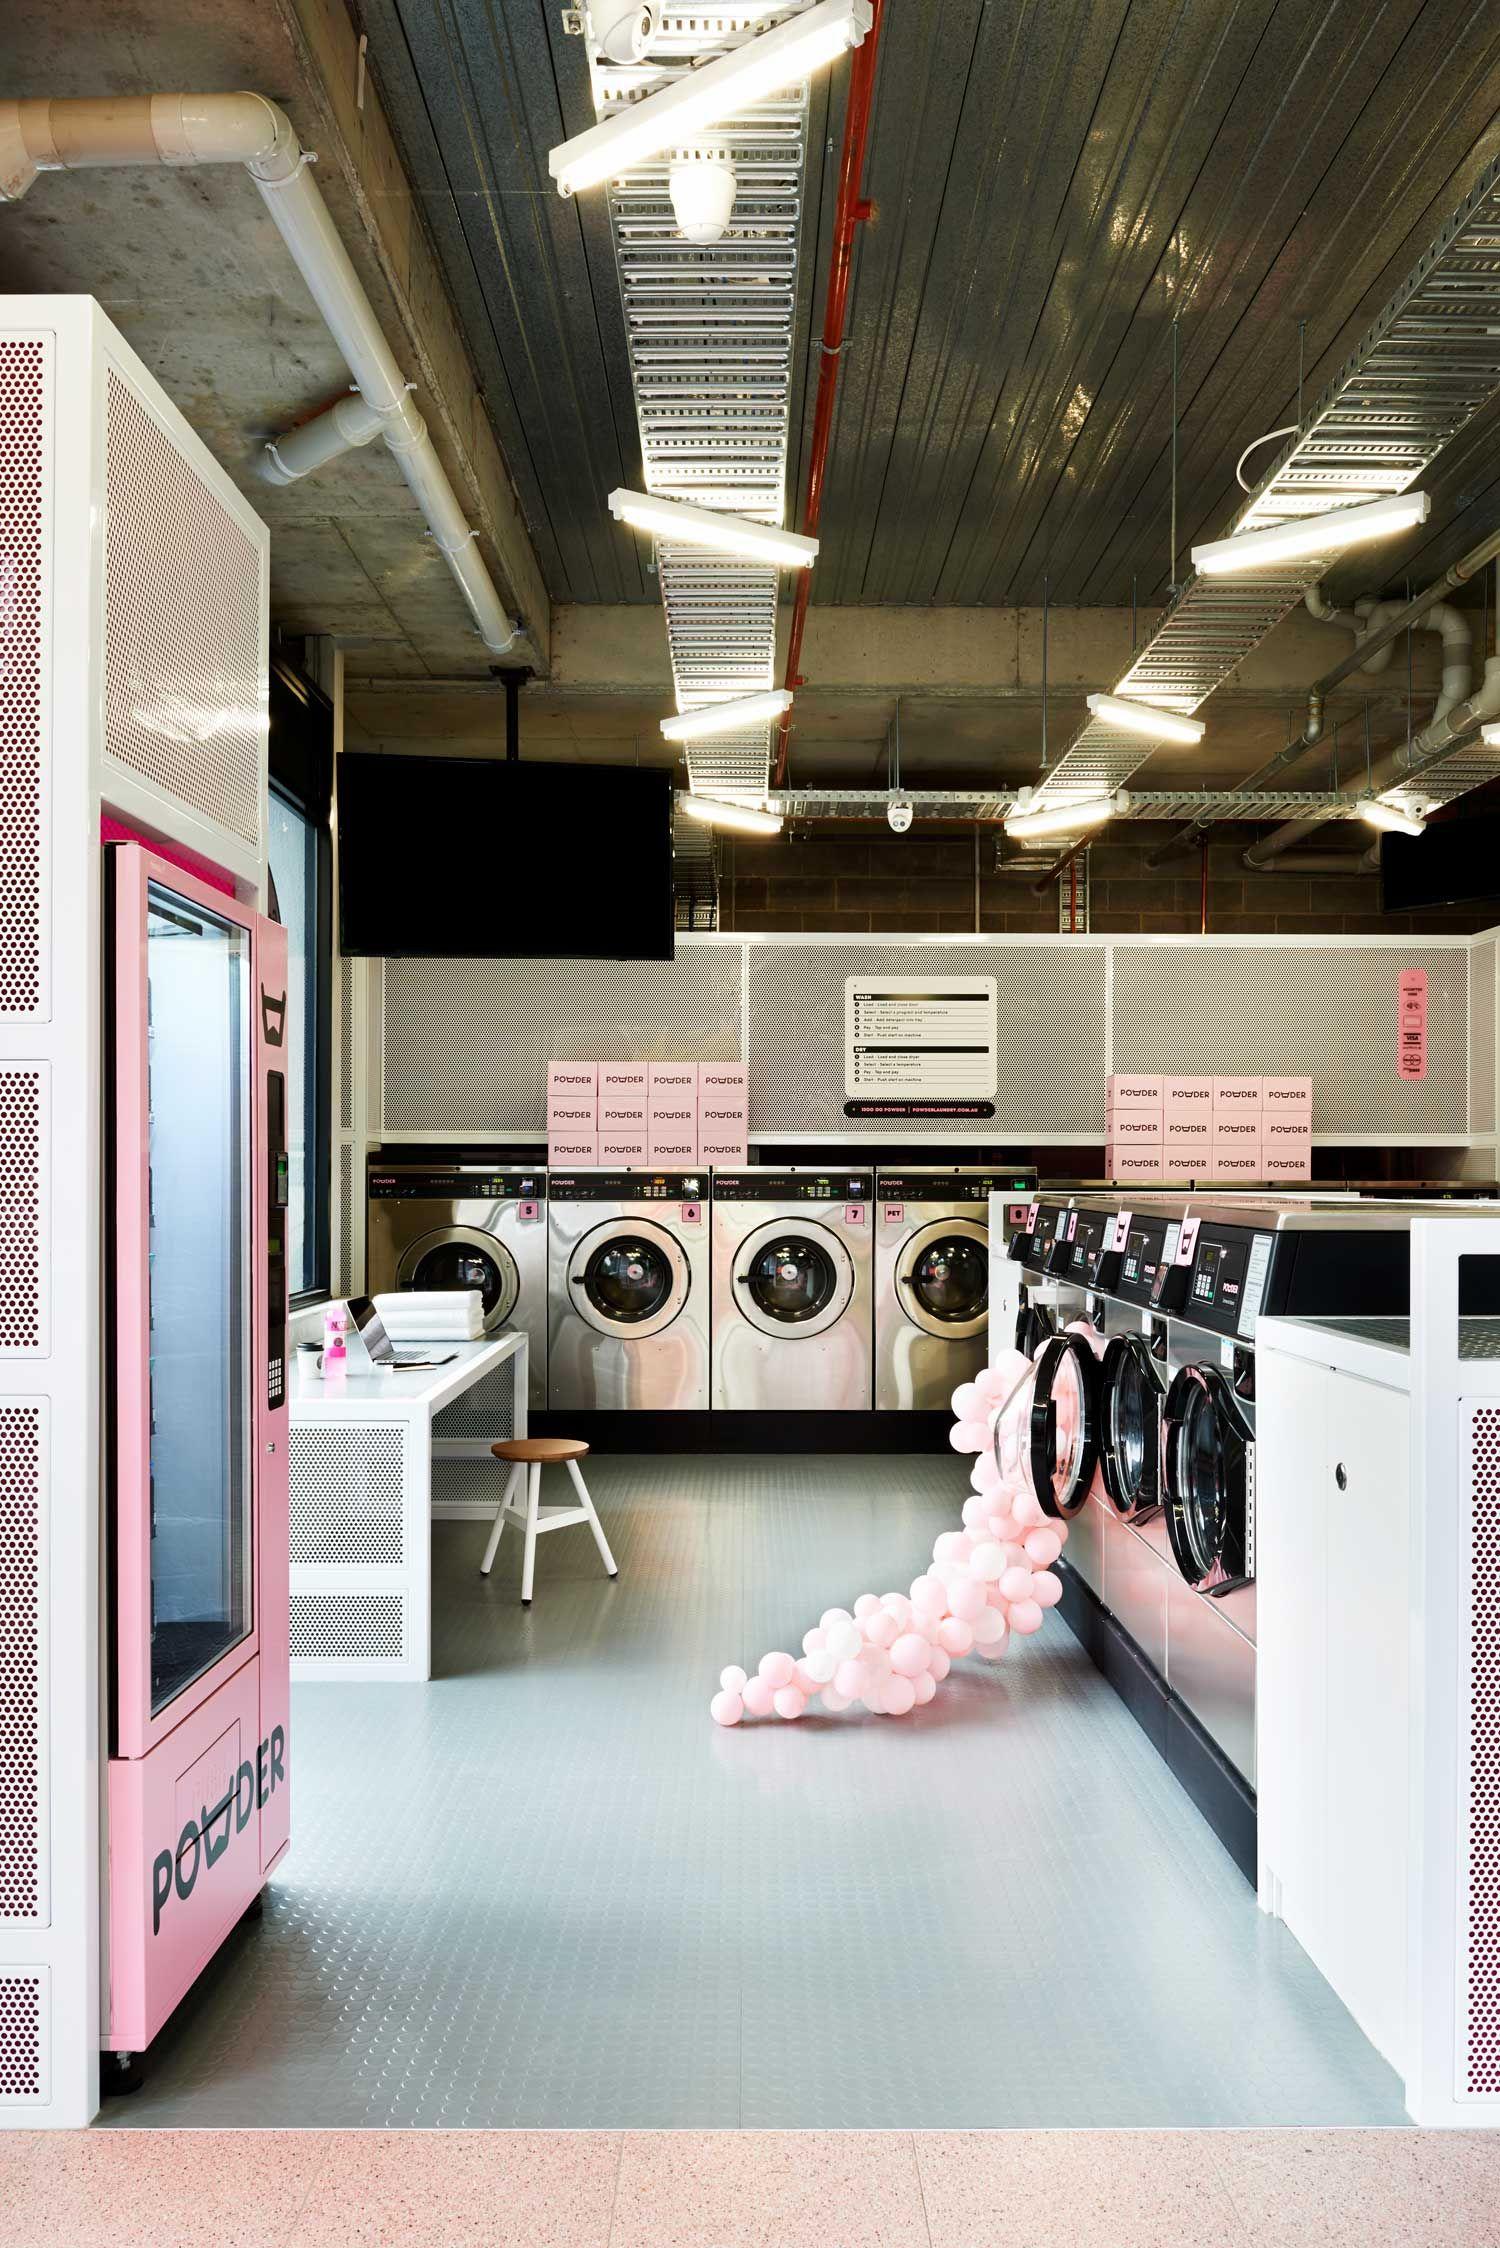 These Are Not Your Average Laundromats Laundry Shop Laundry